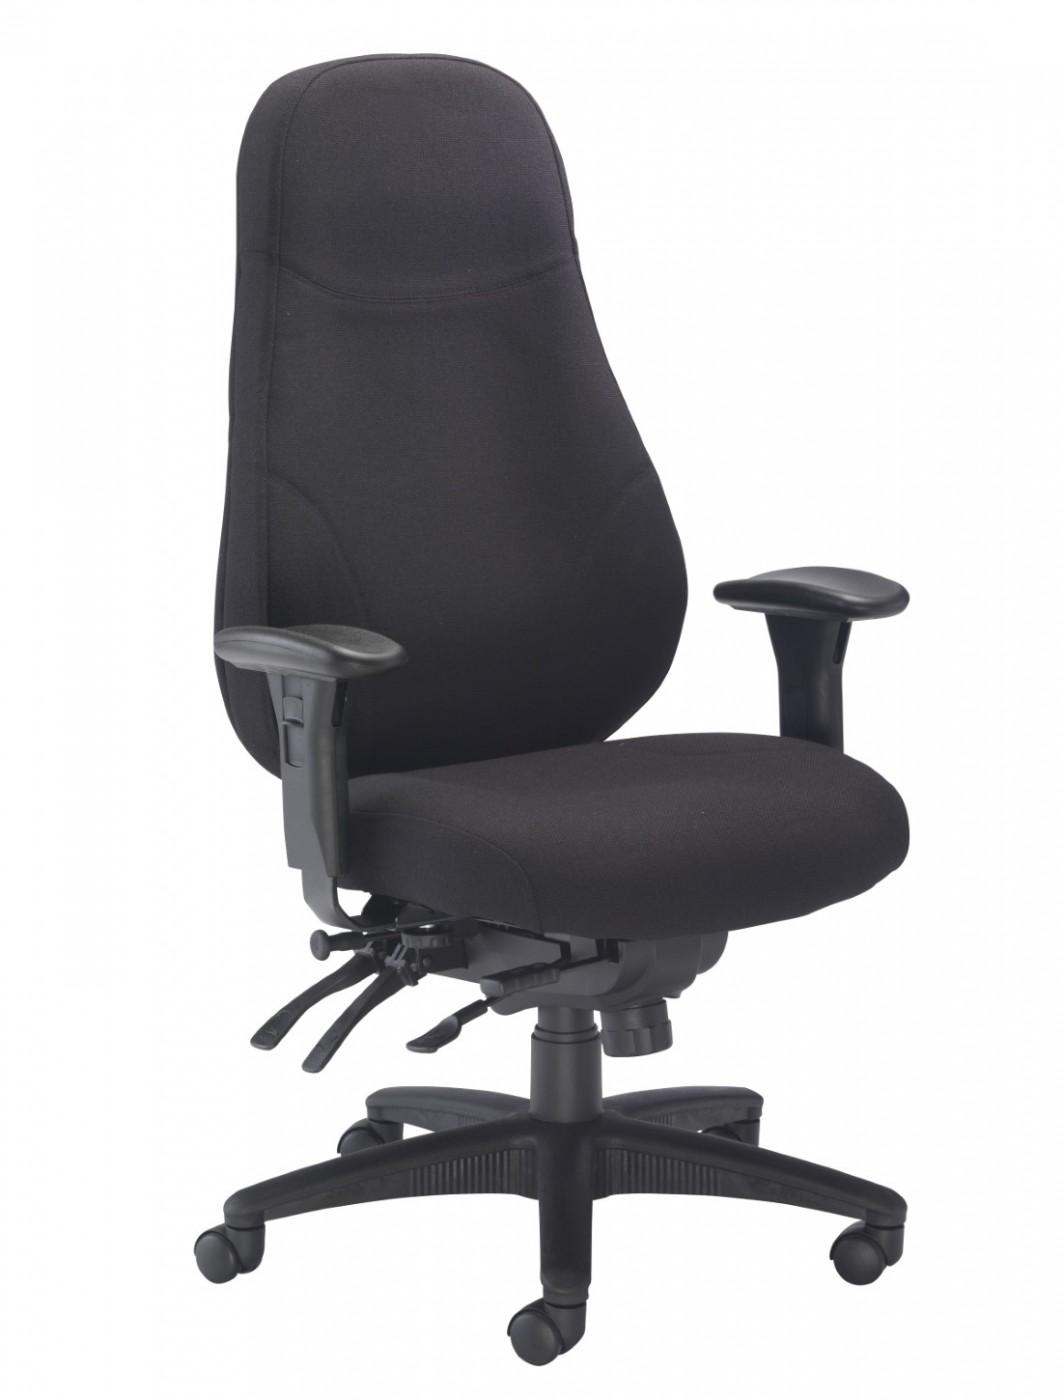 Office Chairs Tc Cheetah High Back Office Chair Ch1111bk 121 Office Furniture